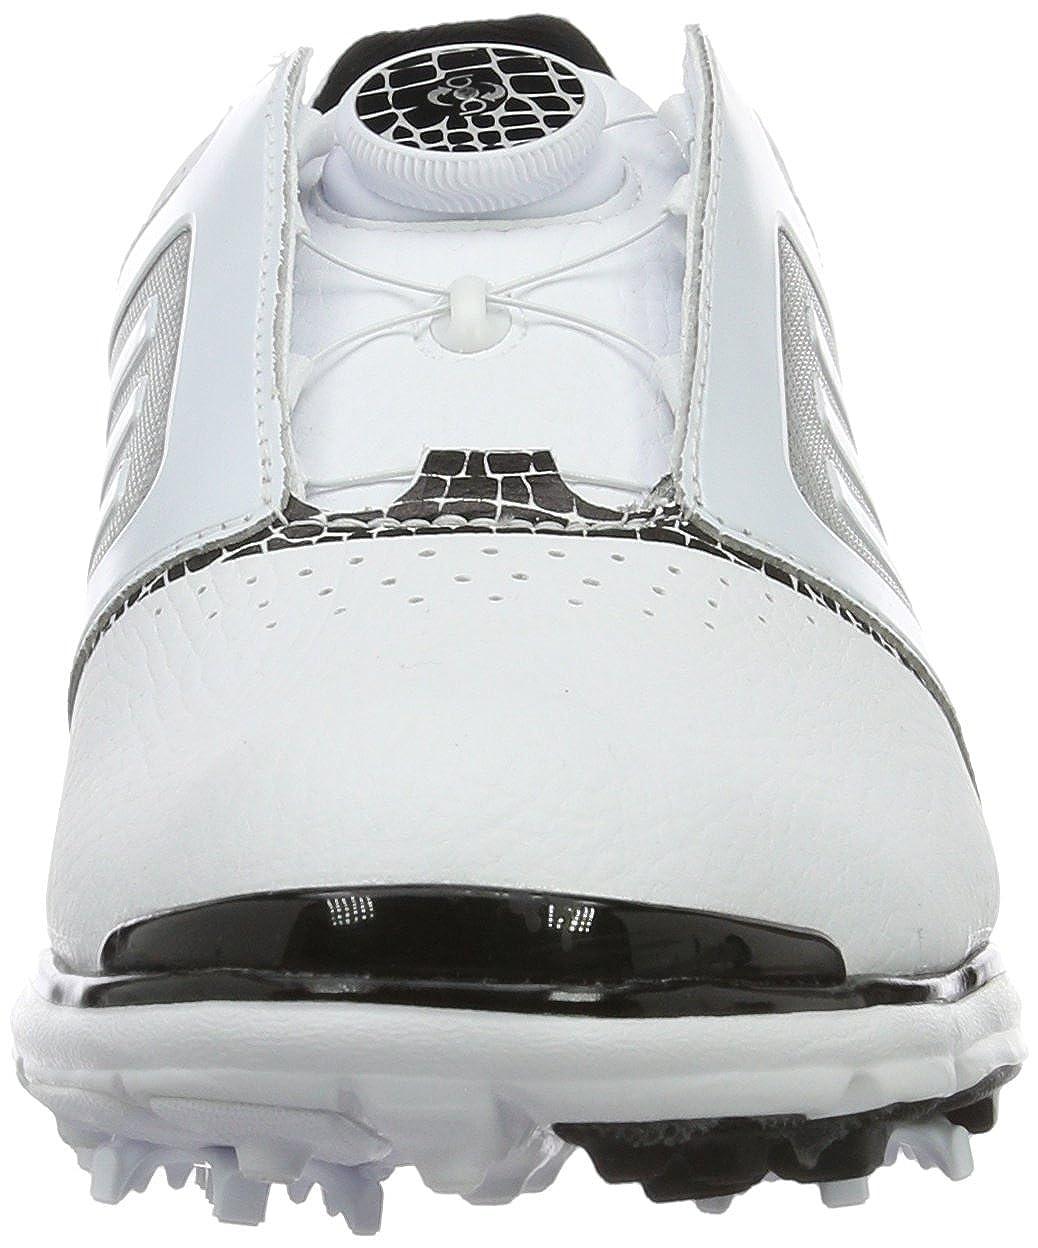 promo code f2182 cfd78 adidas Adistar Tour B, Scarpe da Golf Donna Amazon.it Scarpe